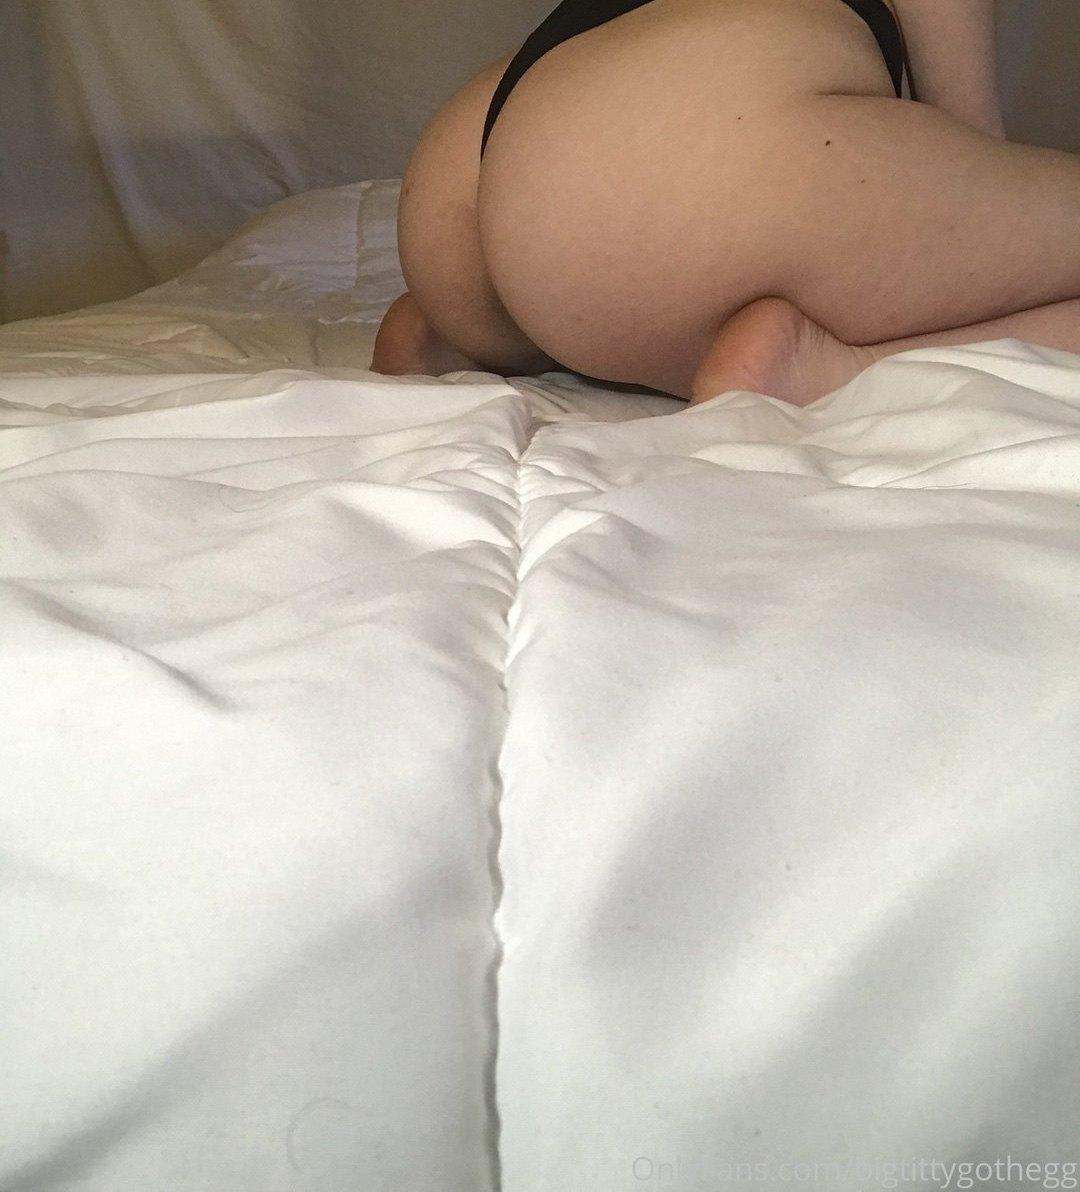 Lee Bigtittygothegg Onlyfans Nudes Leaks 0003